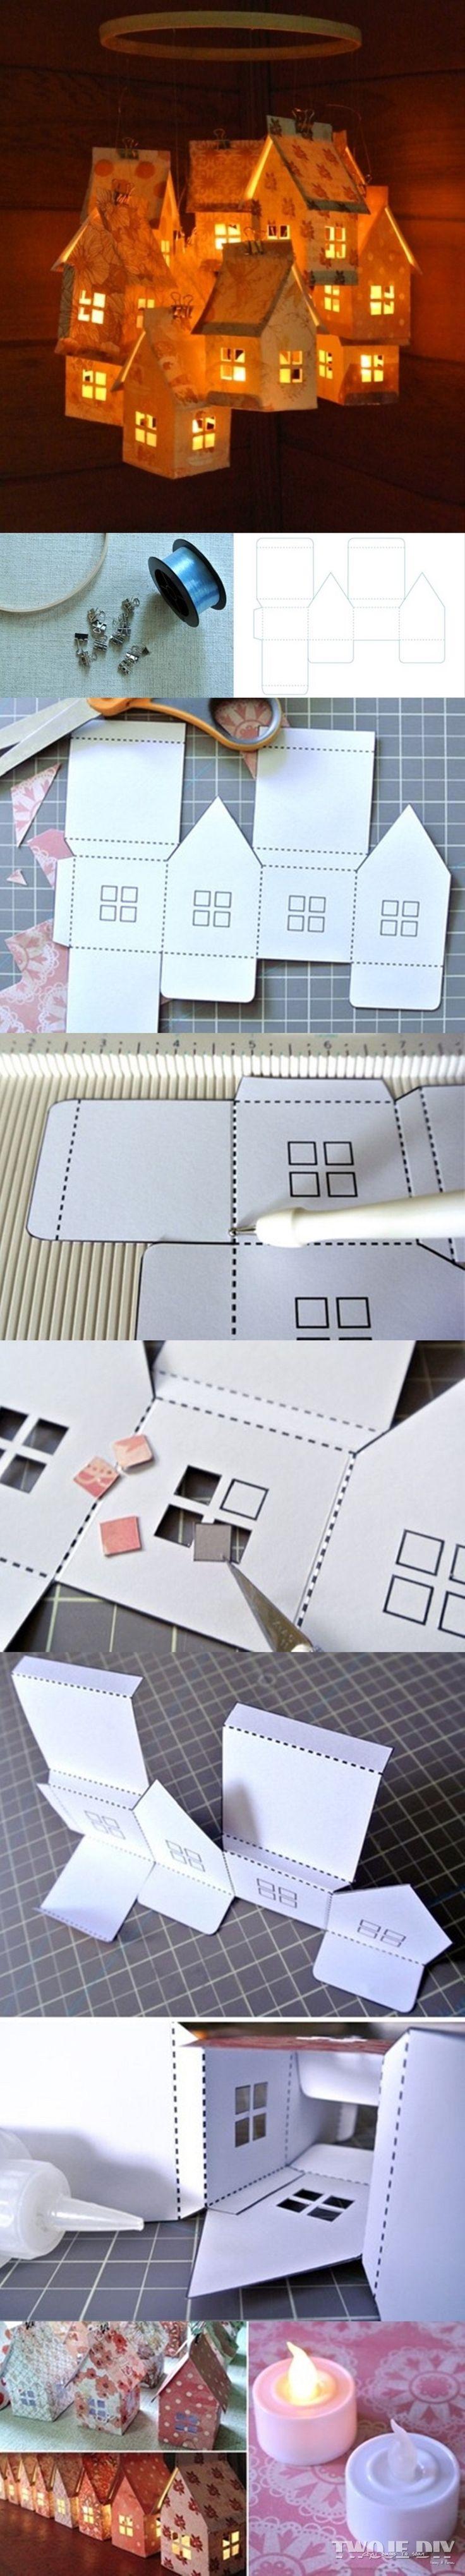 Tiny lit houses. (Mobile?) Link is broken. Looks like scrapbook paper, battery tea lights.   Domki latarnie